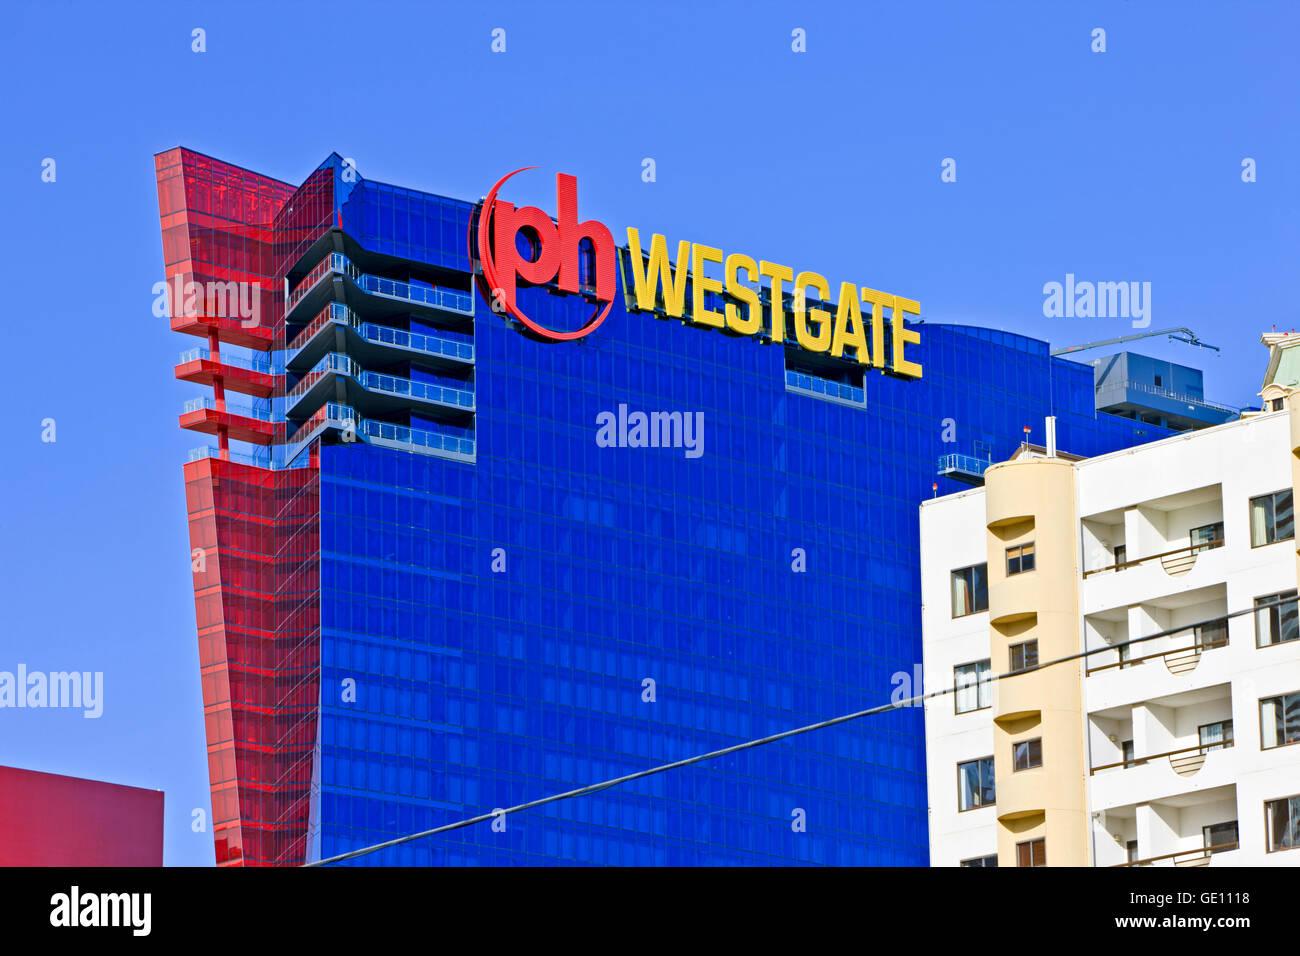 Geography Travel Usa Nevada Las Vegas Ph Westgate Hotel Stock Photo Alamy